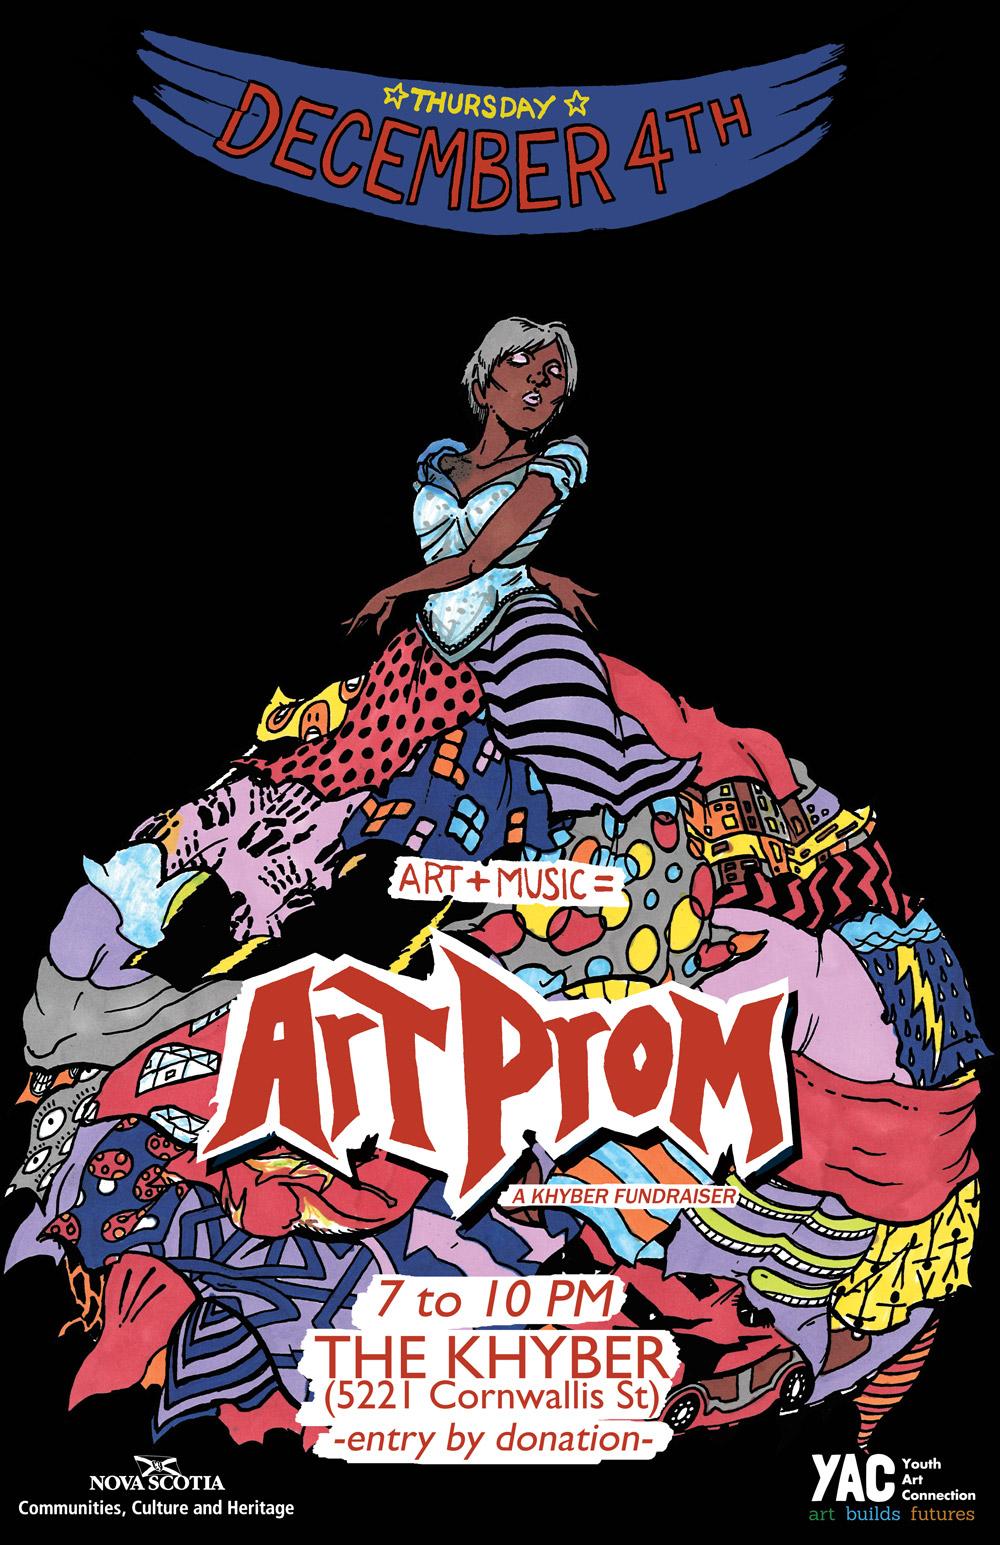 art prom poster